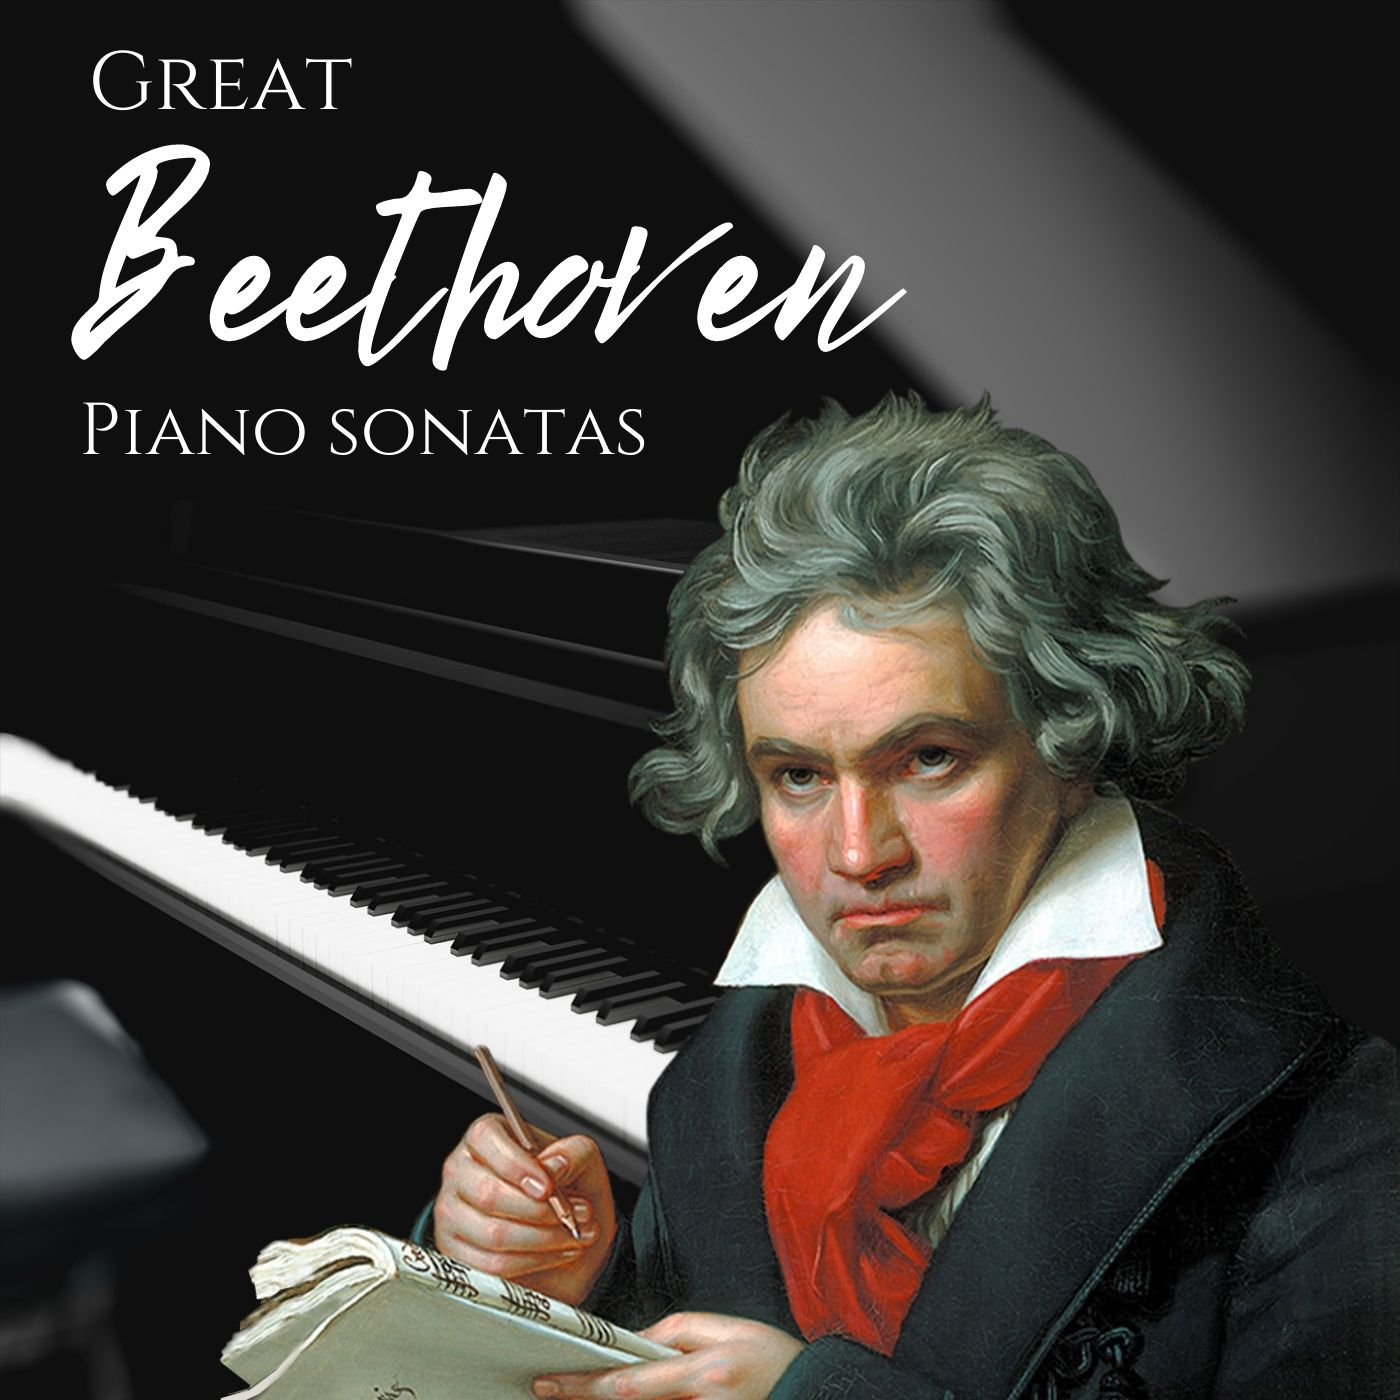 Great Beethoven Piano Sonatas